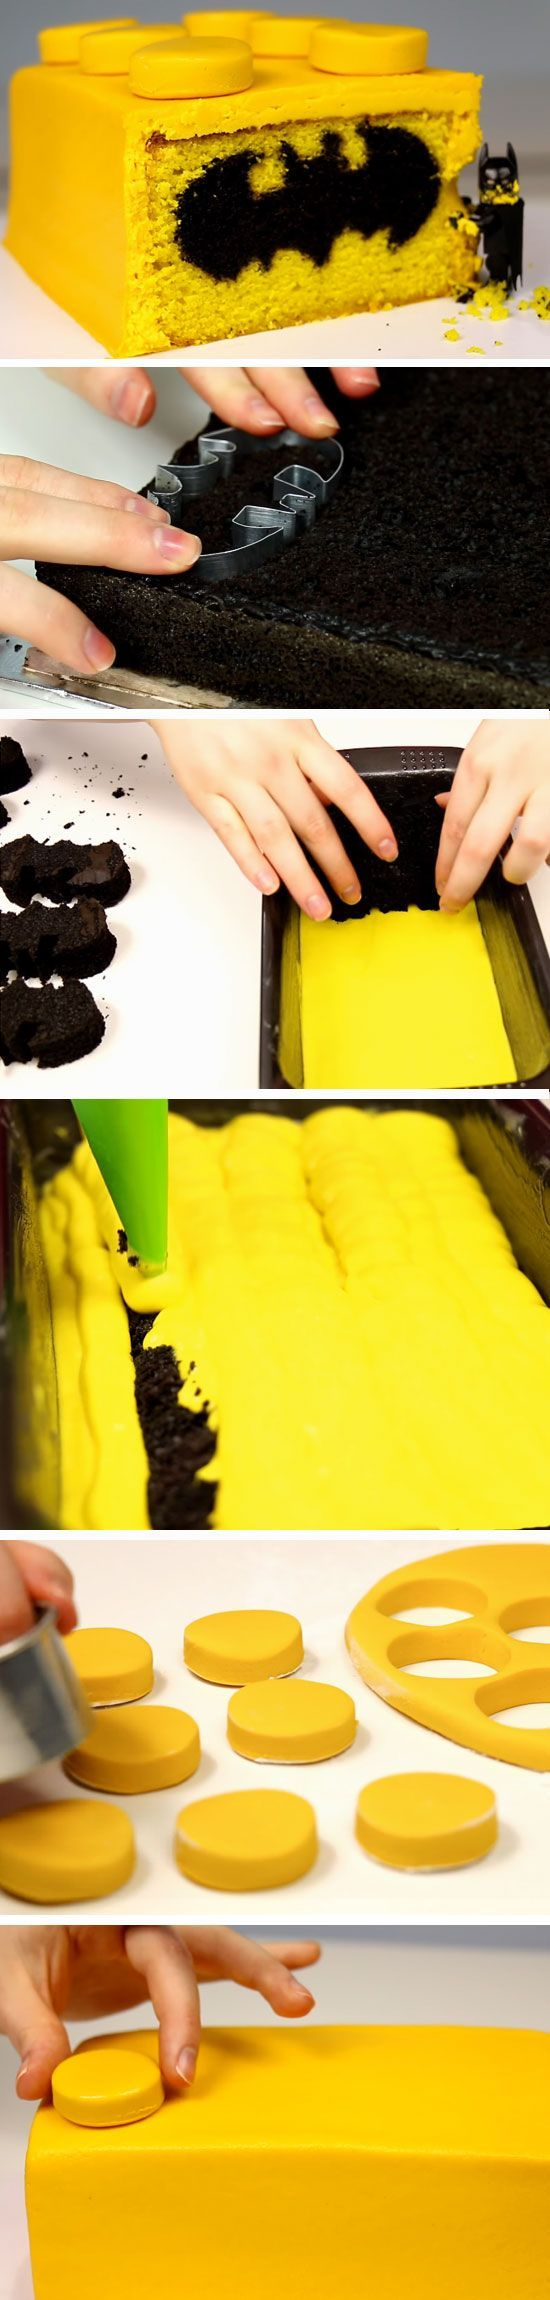 Lego Batman Cake | Birthday Party Ideas for Boys | DIY Halloween Party Food for Kids